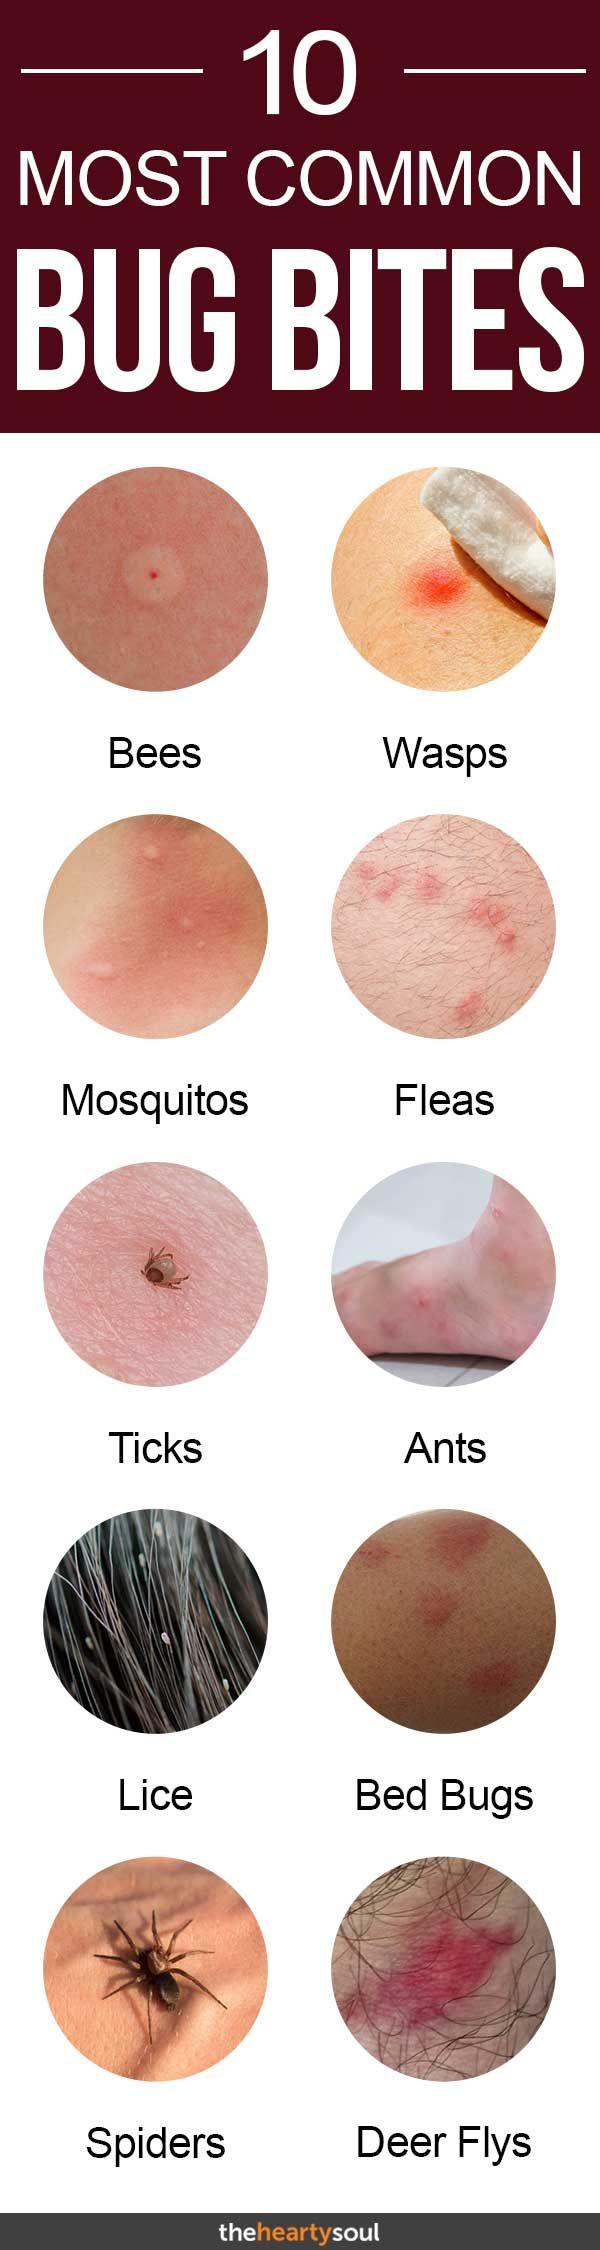 fleas, ticks, black widow spiders, chiggers, fire ants